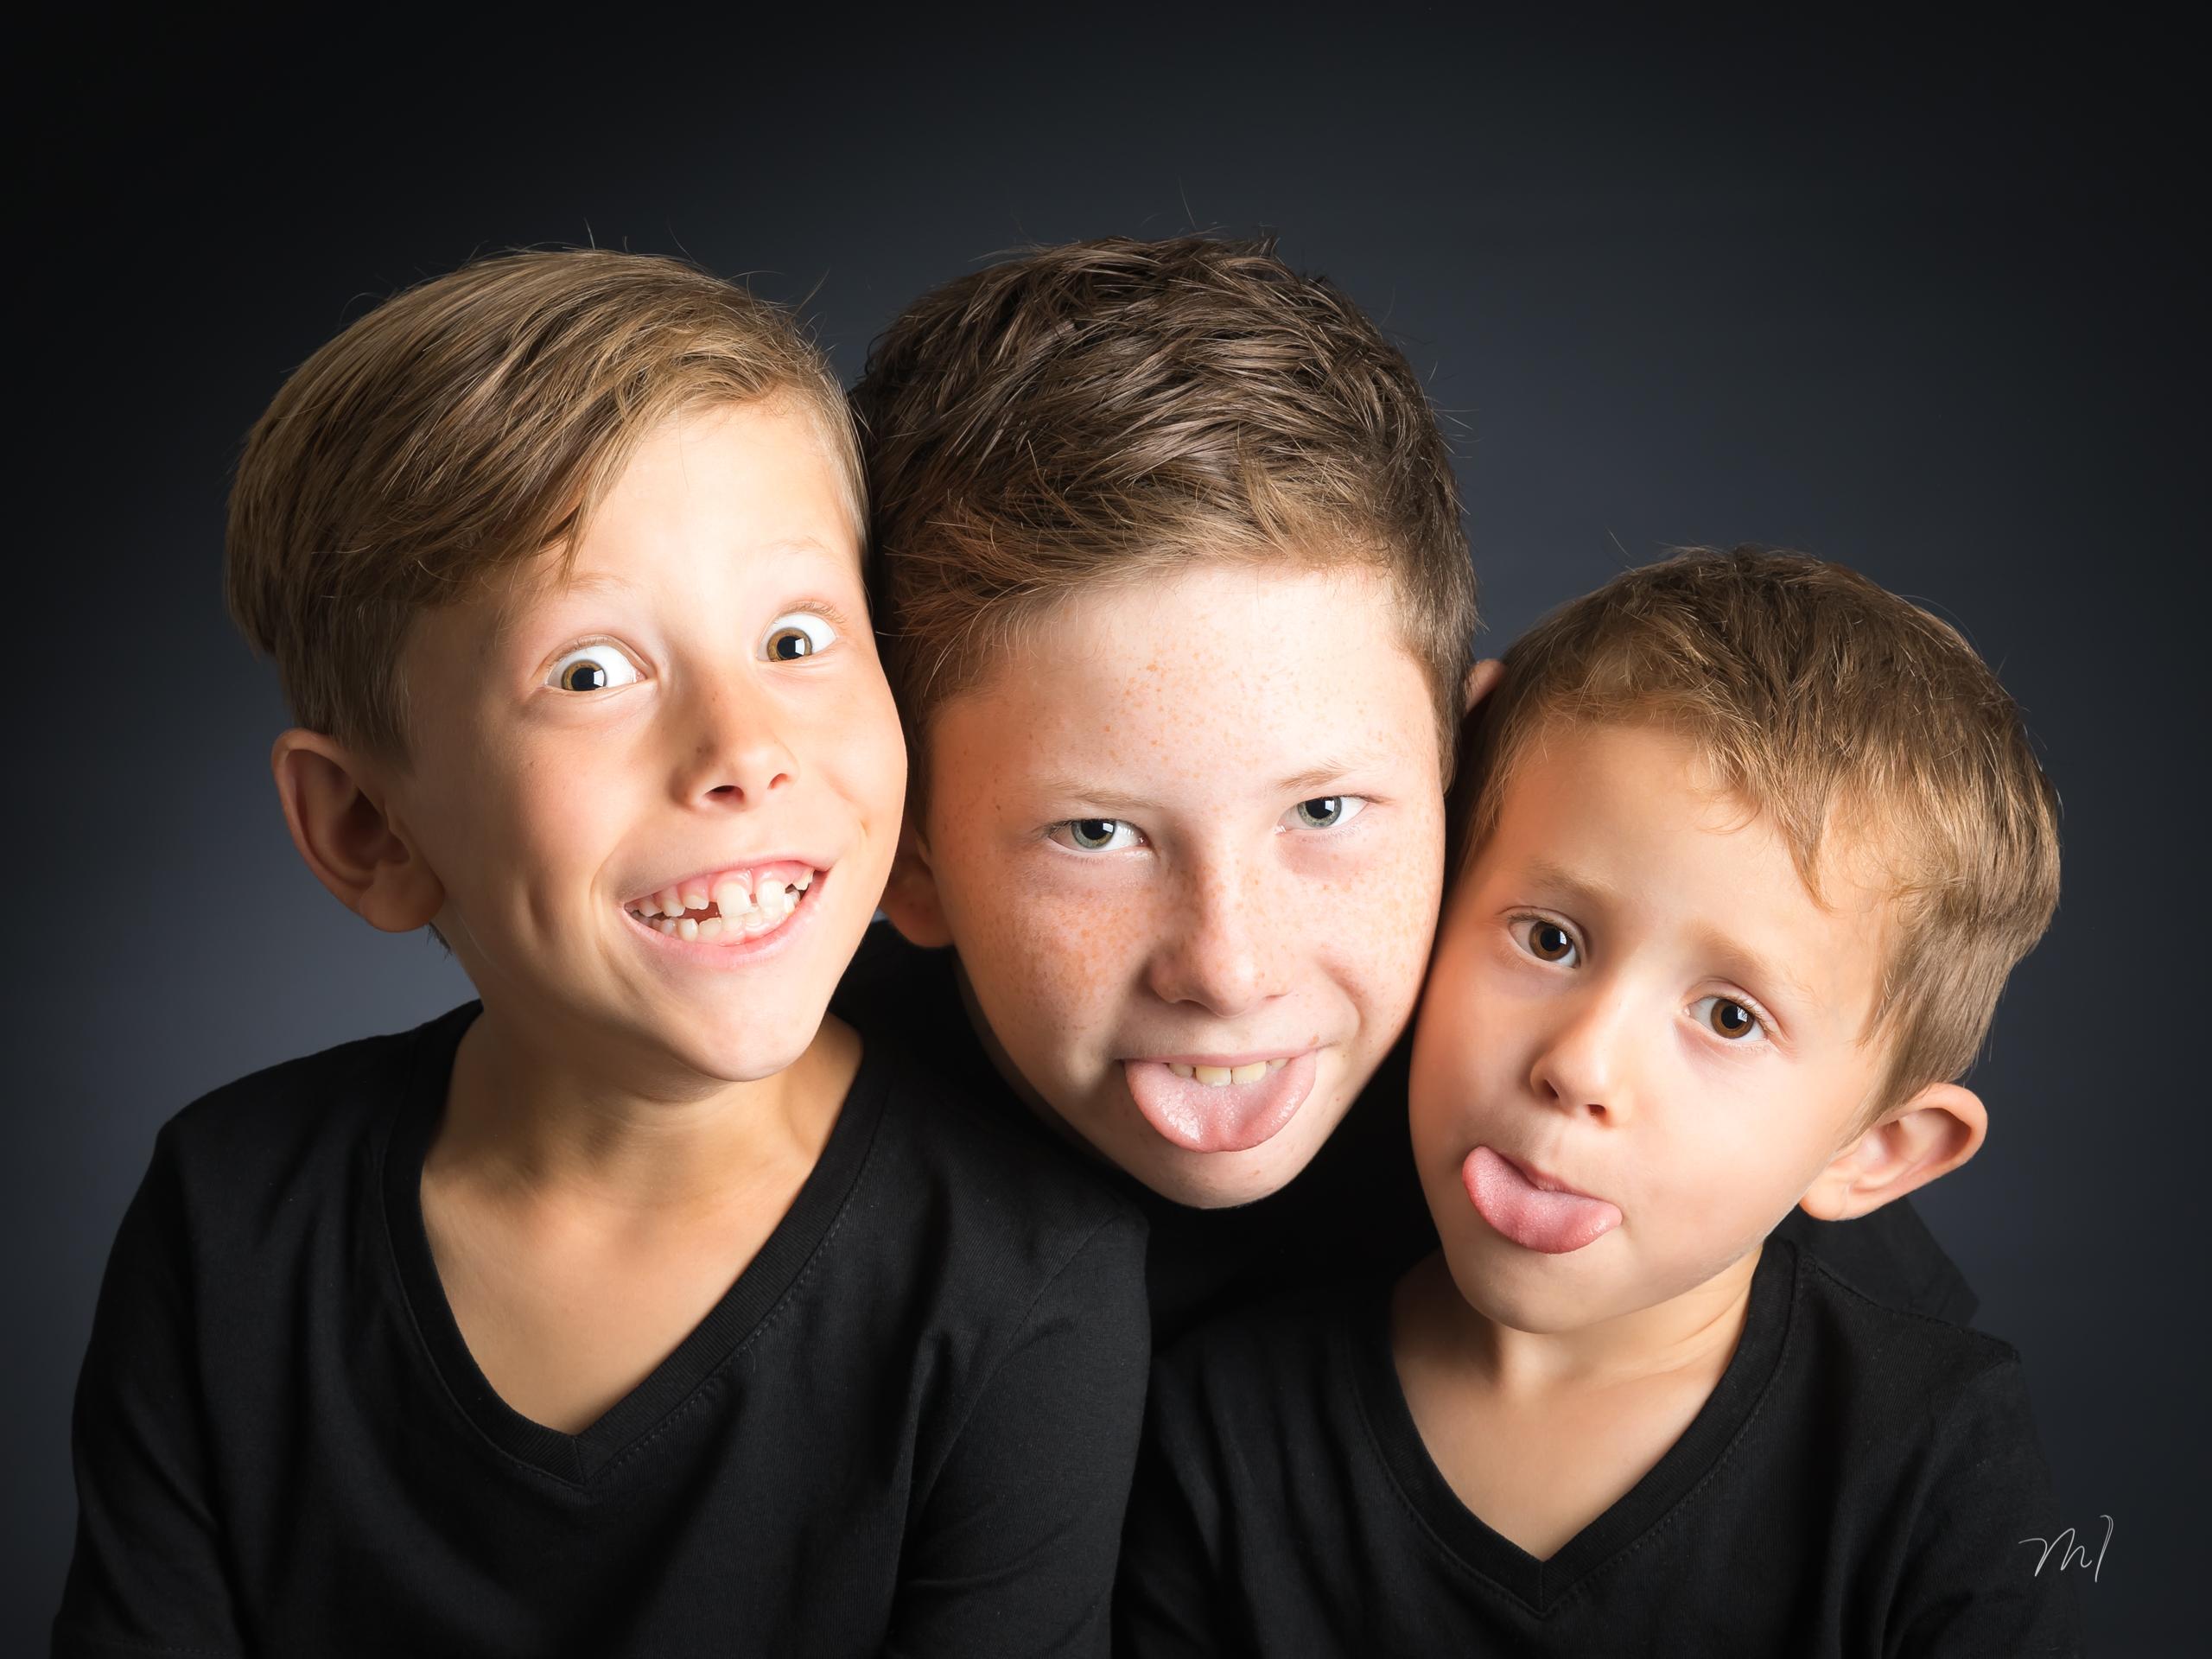 Familles & enfants - Marie Ismalun photographe-4